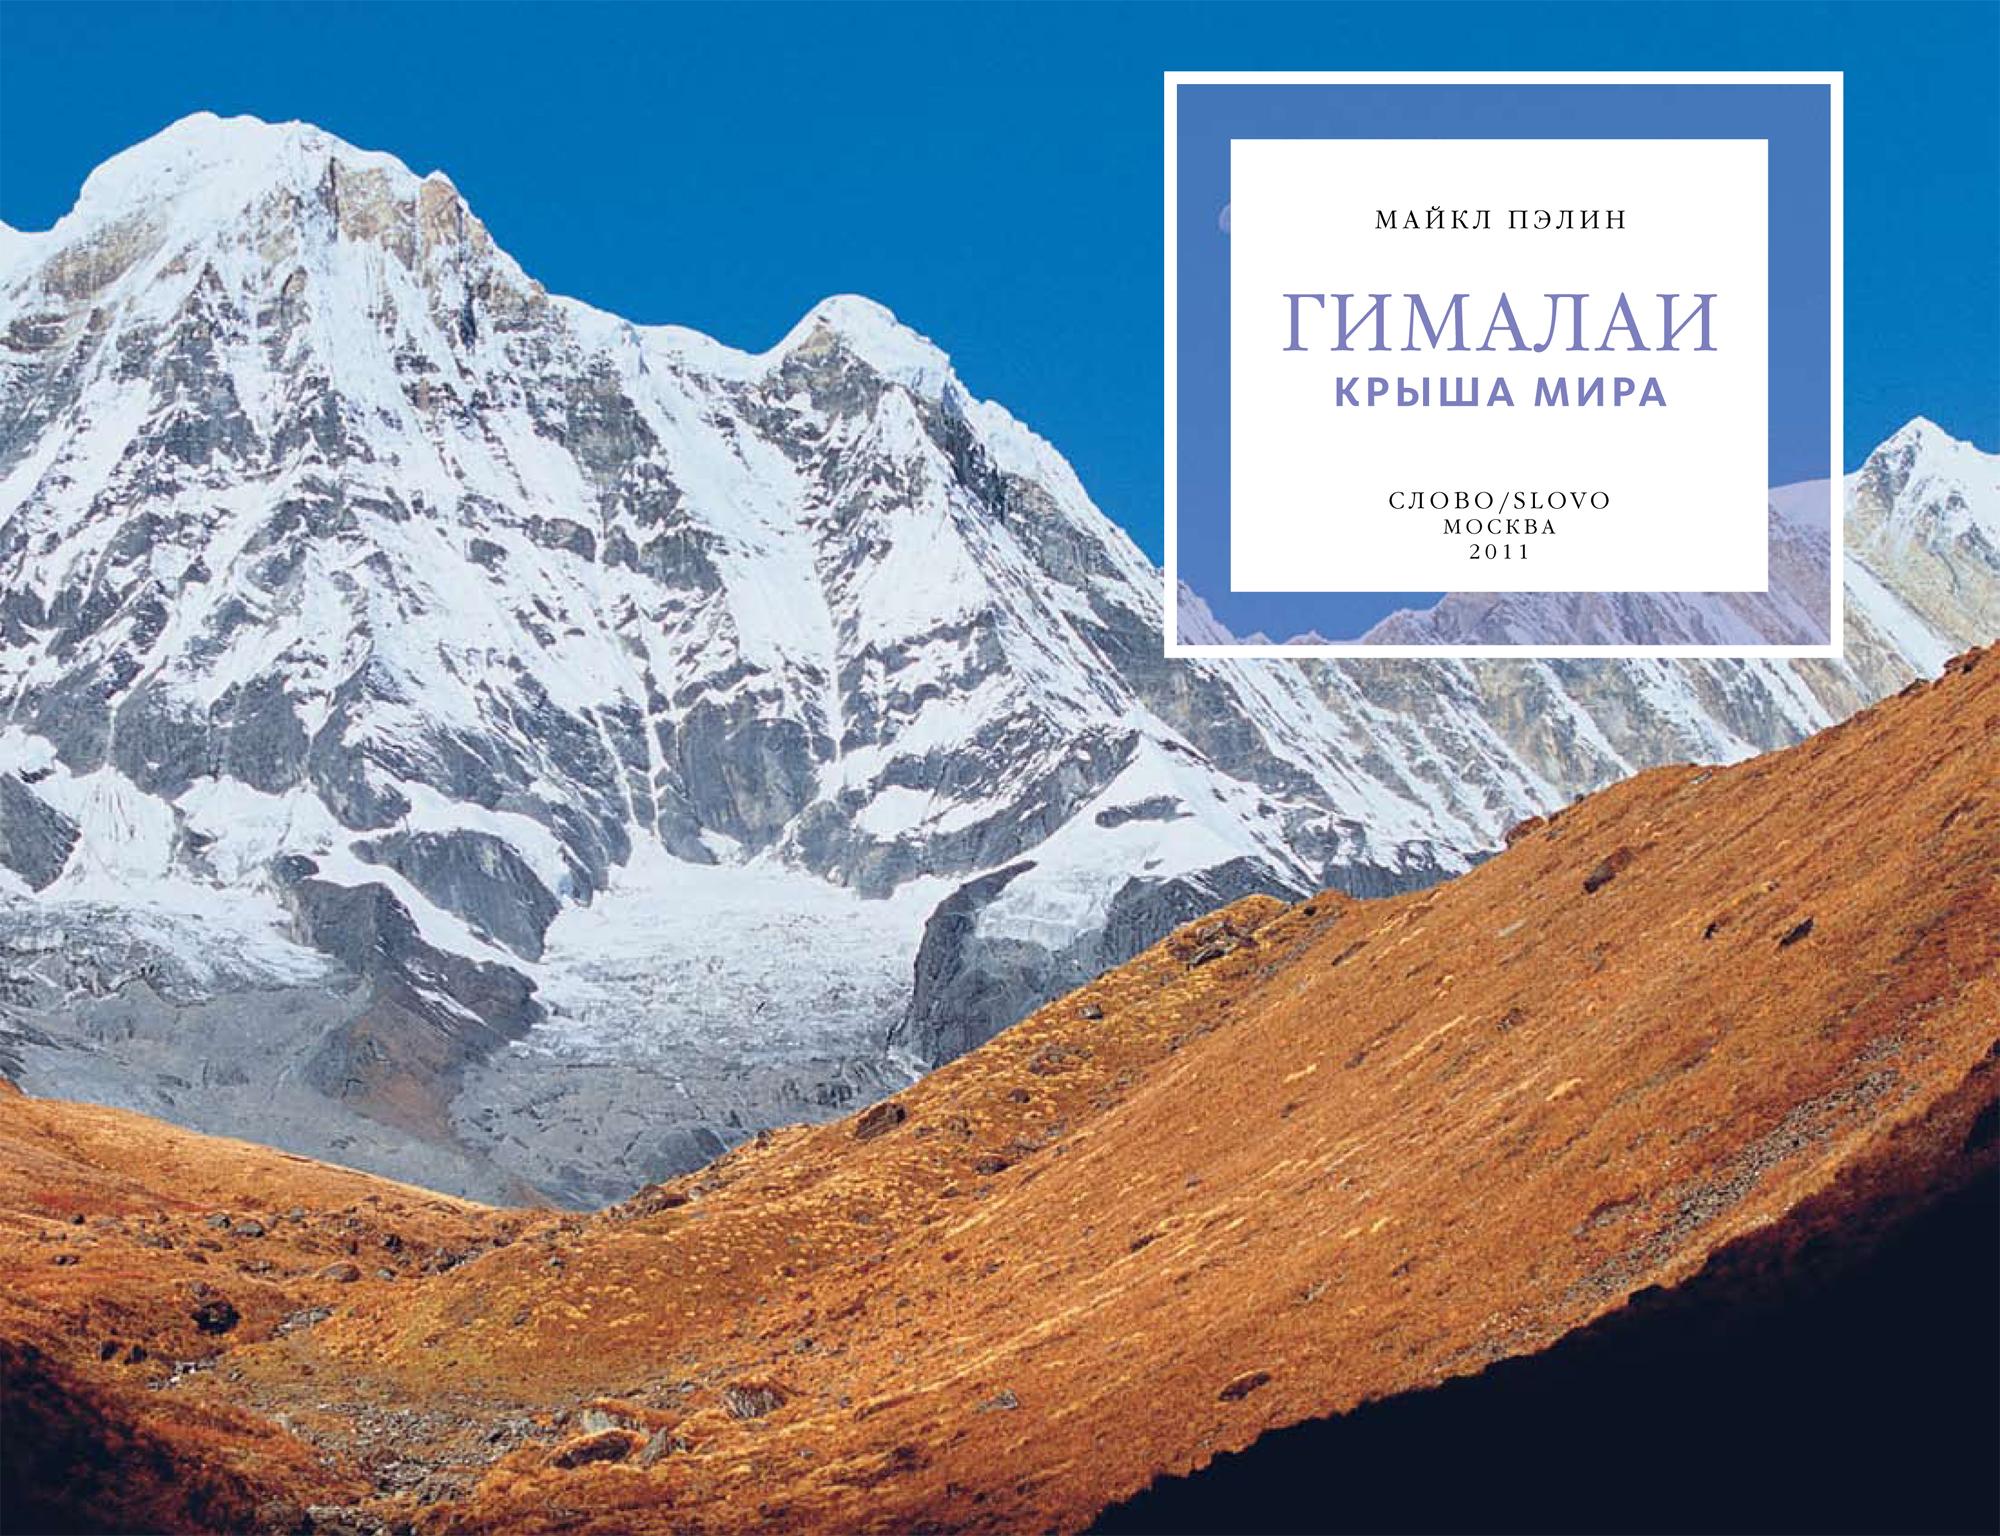 Гималаи — википедия